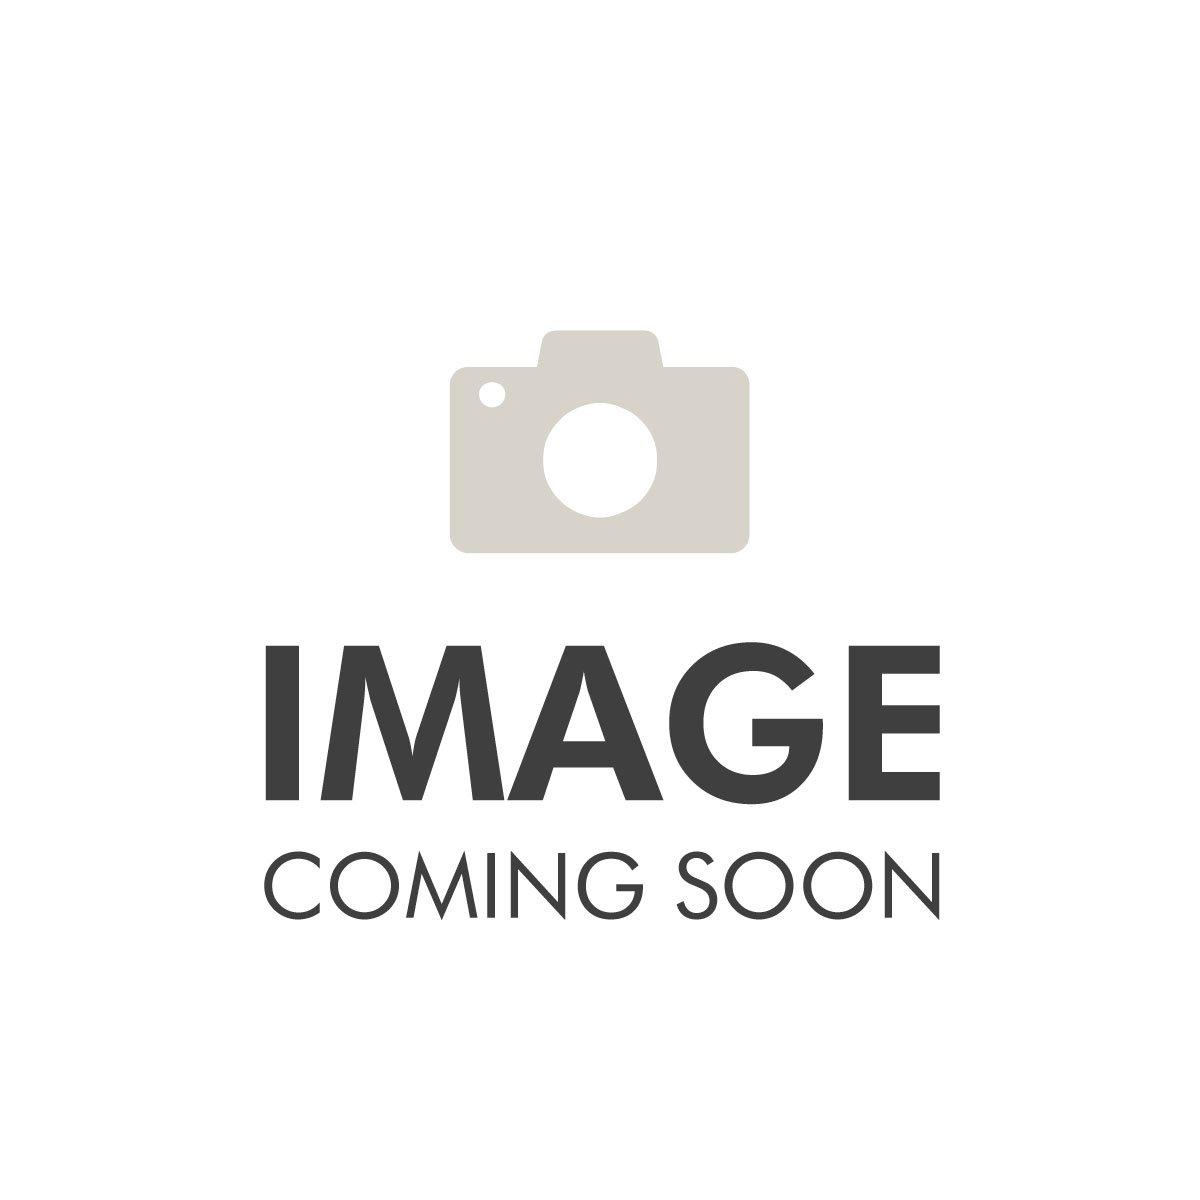 Ciate Ciaté Corrupted Neon Manicure Gift Set 13.5ml Neon Orange Nail Polish + 10g Neon Glitter + 5ml Black Light Top Coat